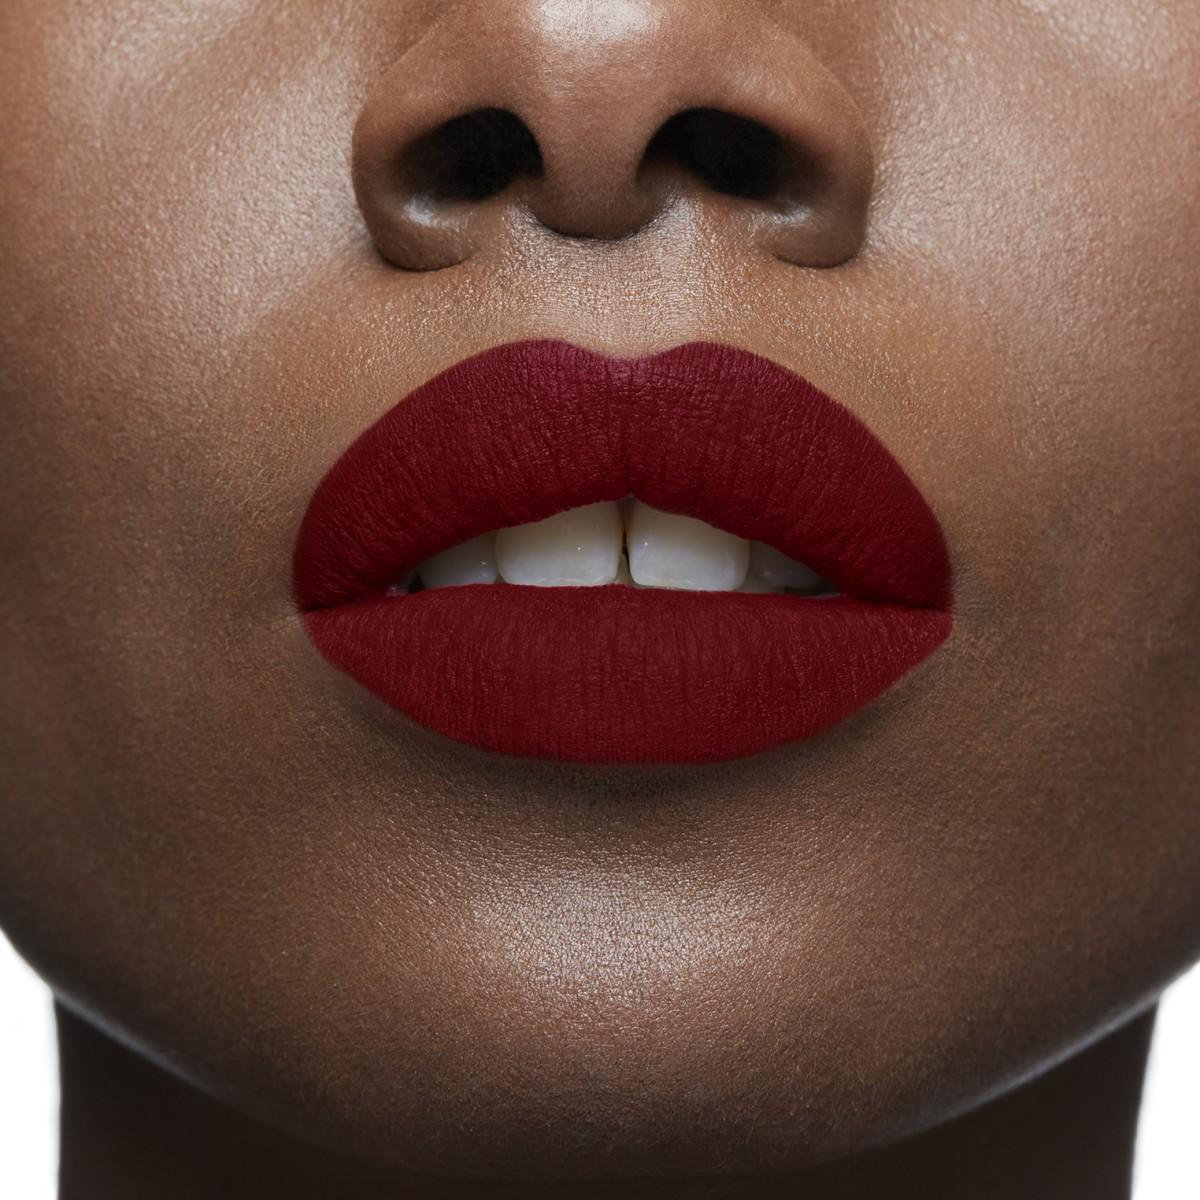 Woman Beauty - リップカラー ジャルージー 405m - Christian Louboutin